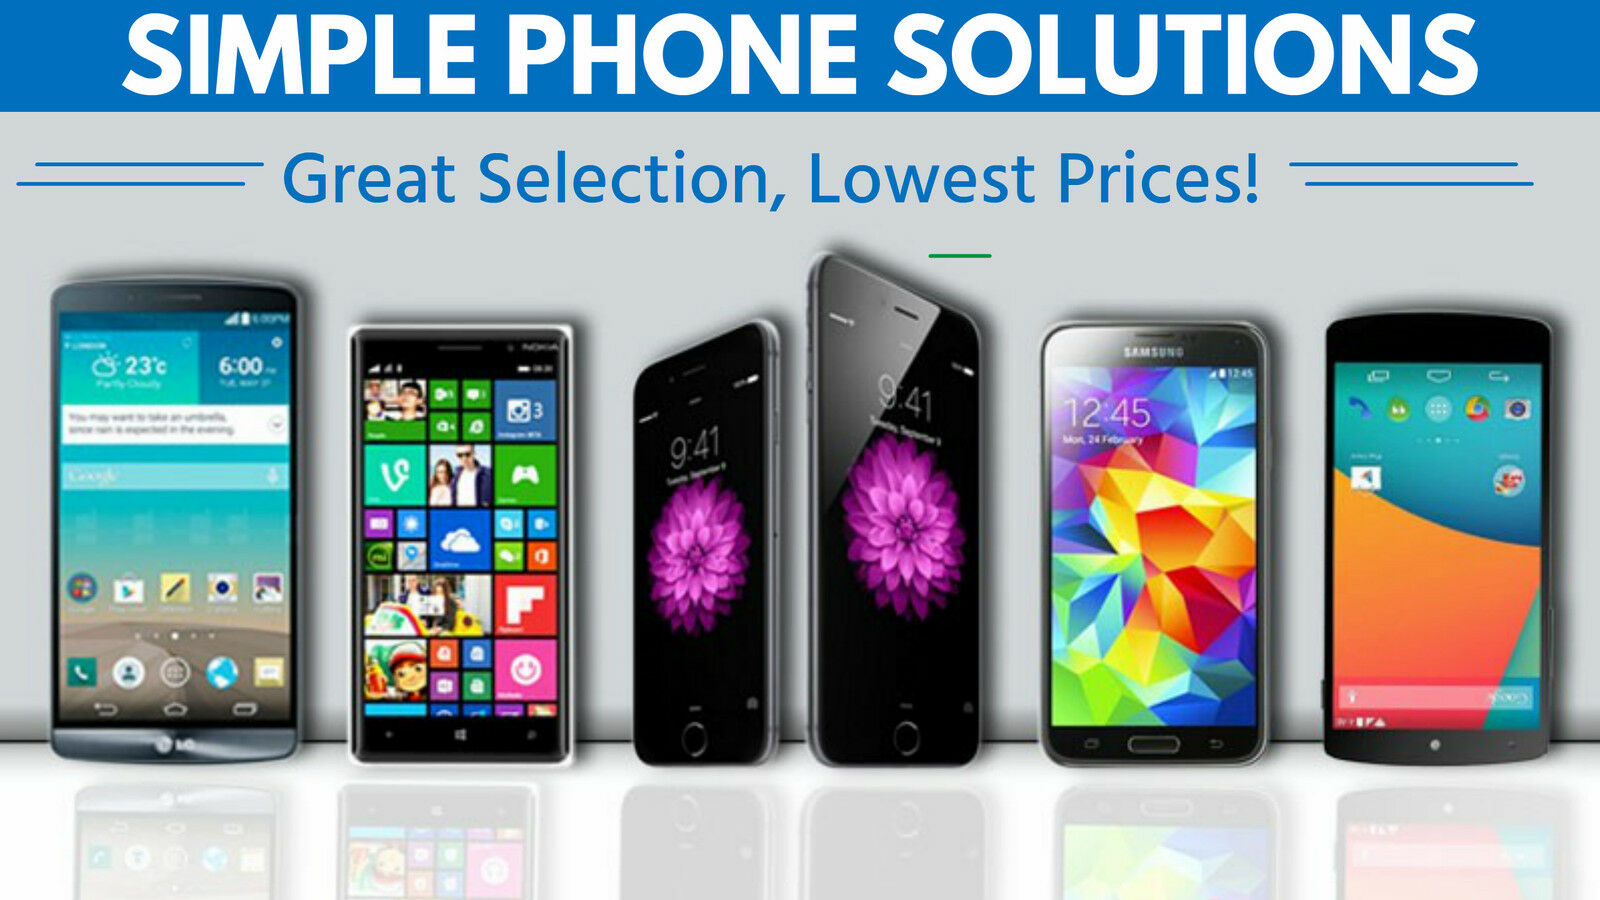 SimplePhoneSolutions